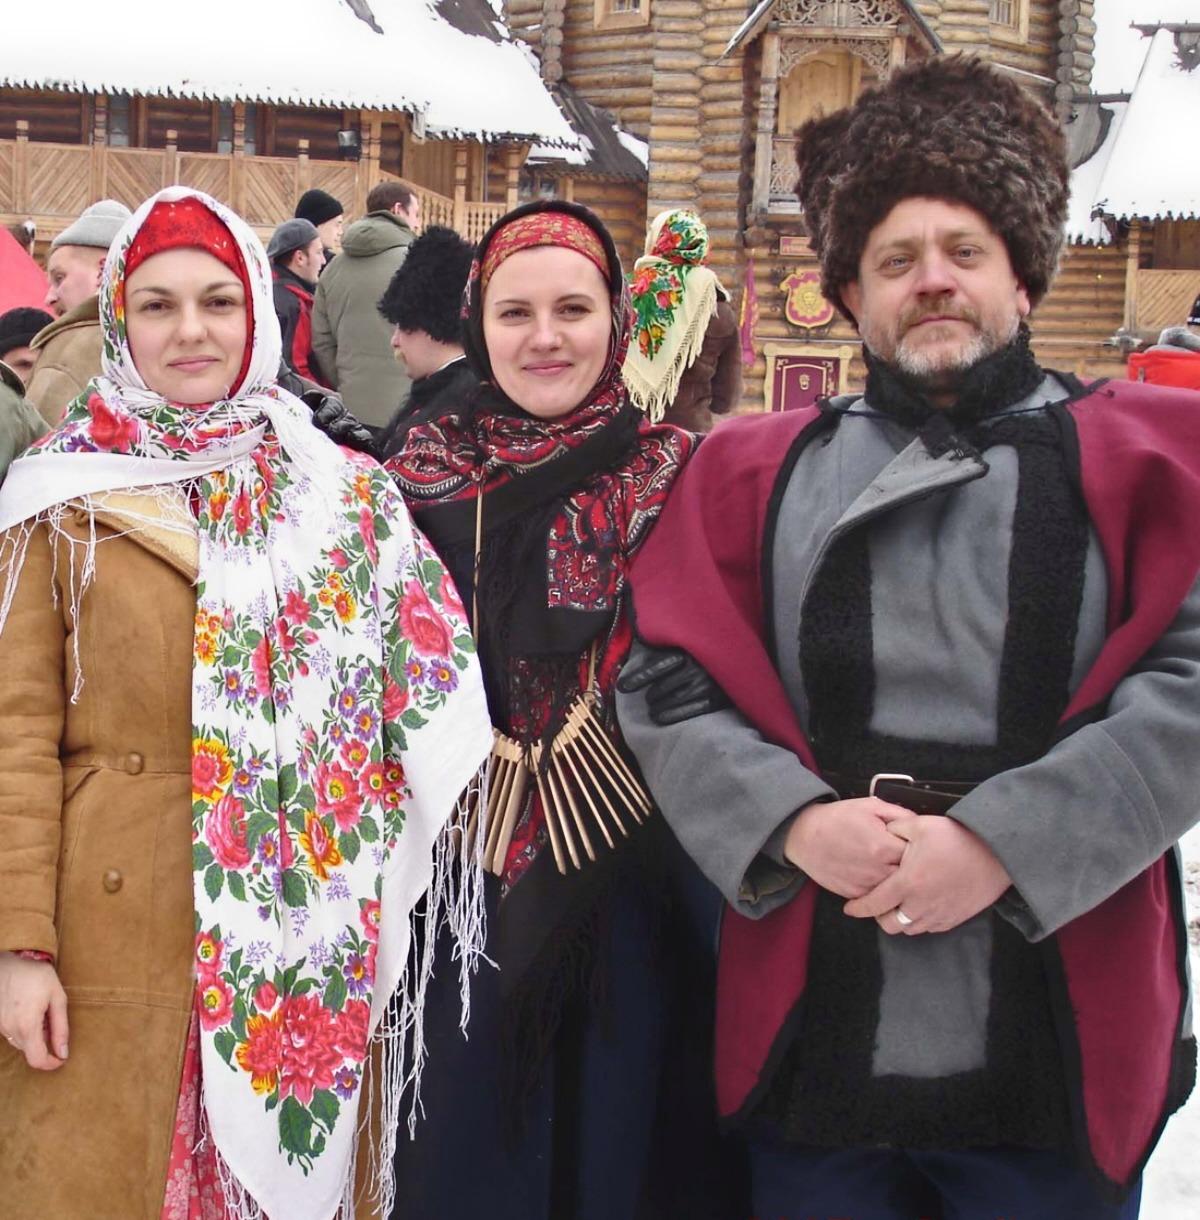 00 Russian Cossacks at Maslenitsa Carnival in Ismailovo